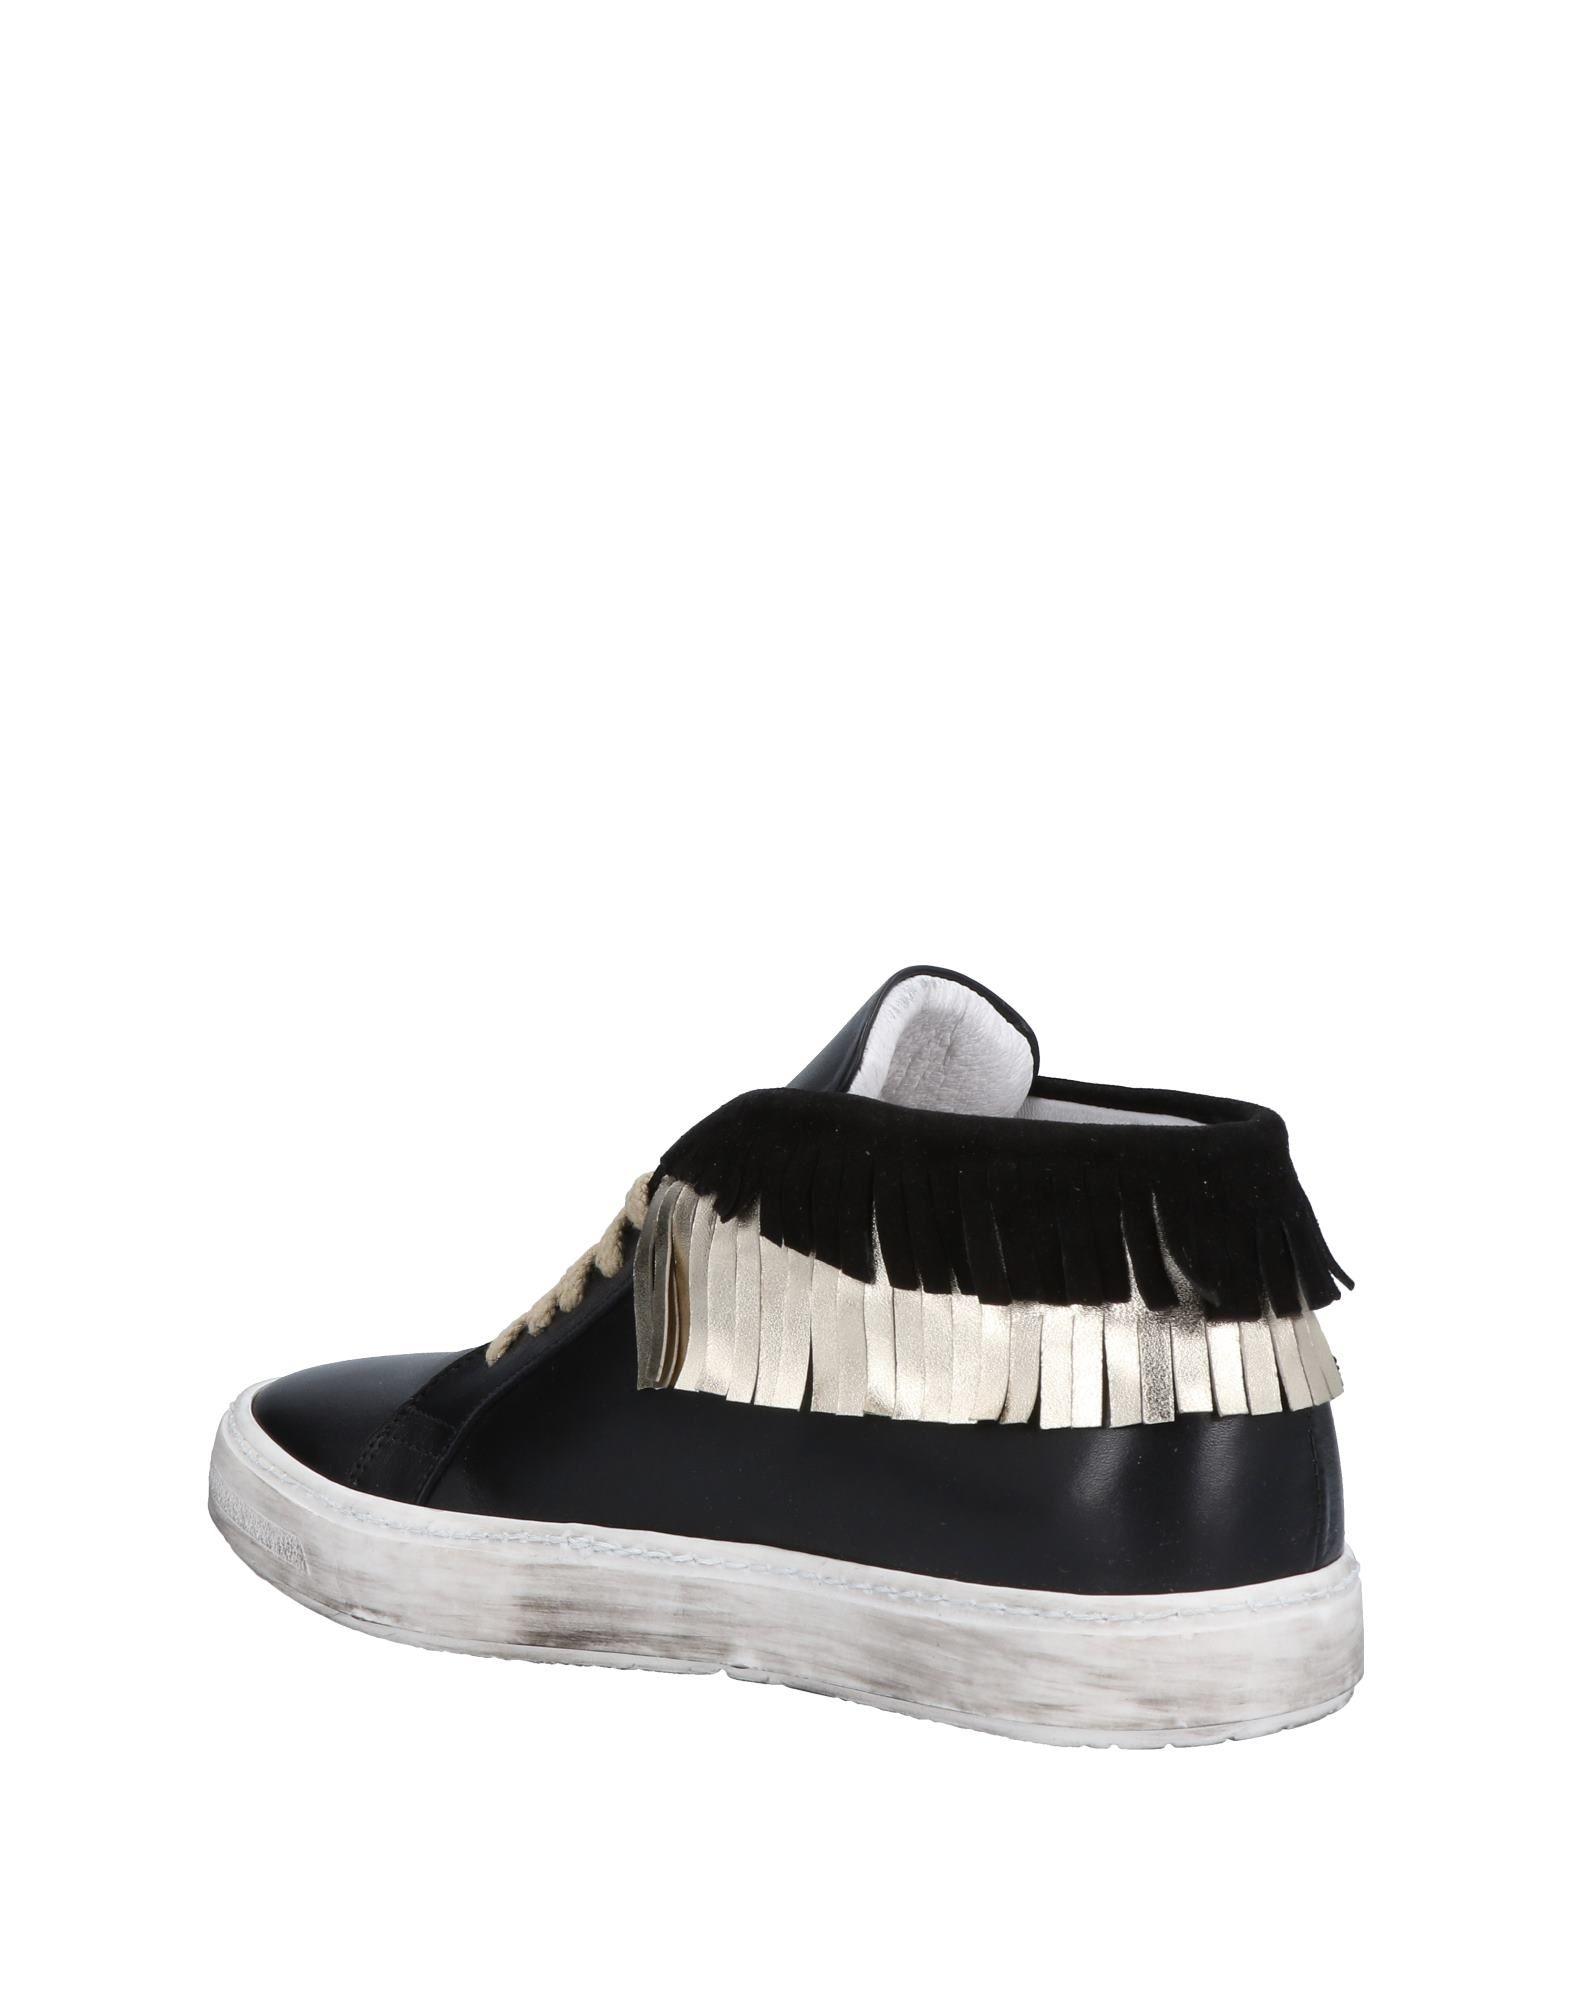 Geneve on Sneakers - Women Geneve Sneakers online on Geneve  Canada - 11470306BG 6b7e8c